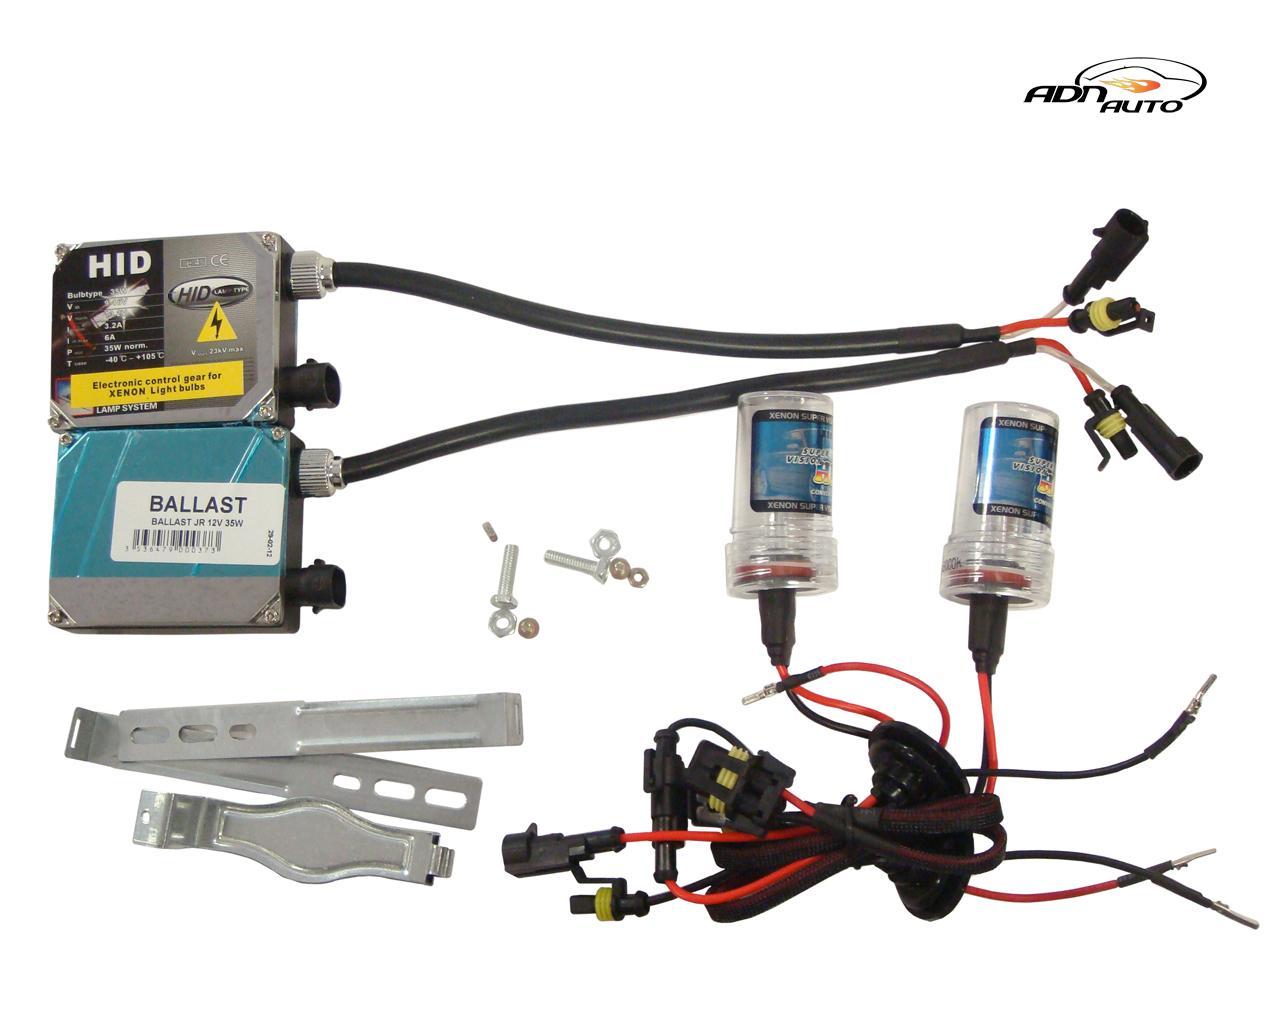 kit ampoule voiture xenon adnauto h1 35w 8000k slim 213322. Black Bedroom Furniture Sets. Home Design Ideas